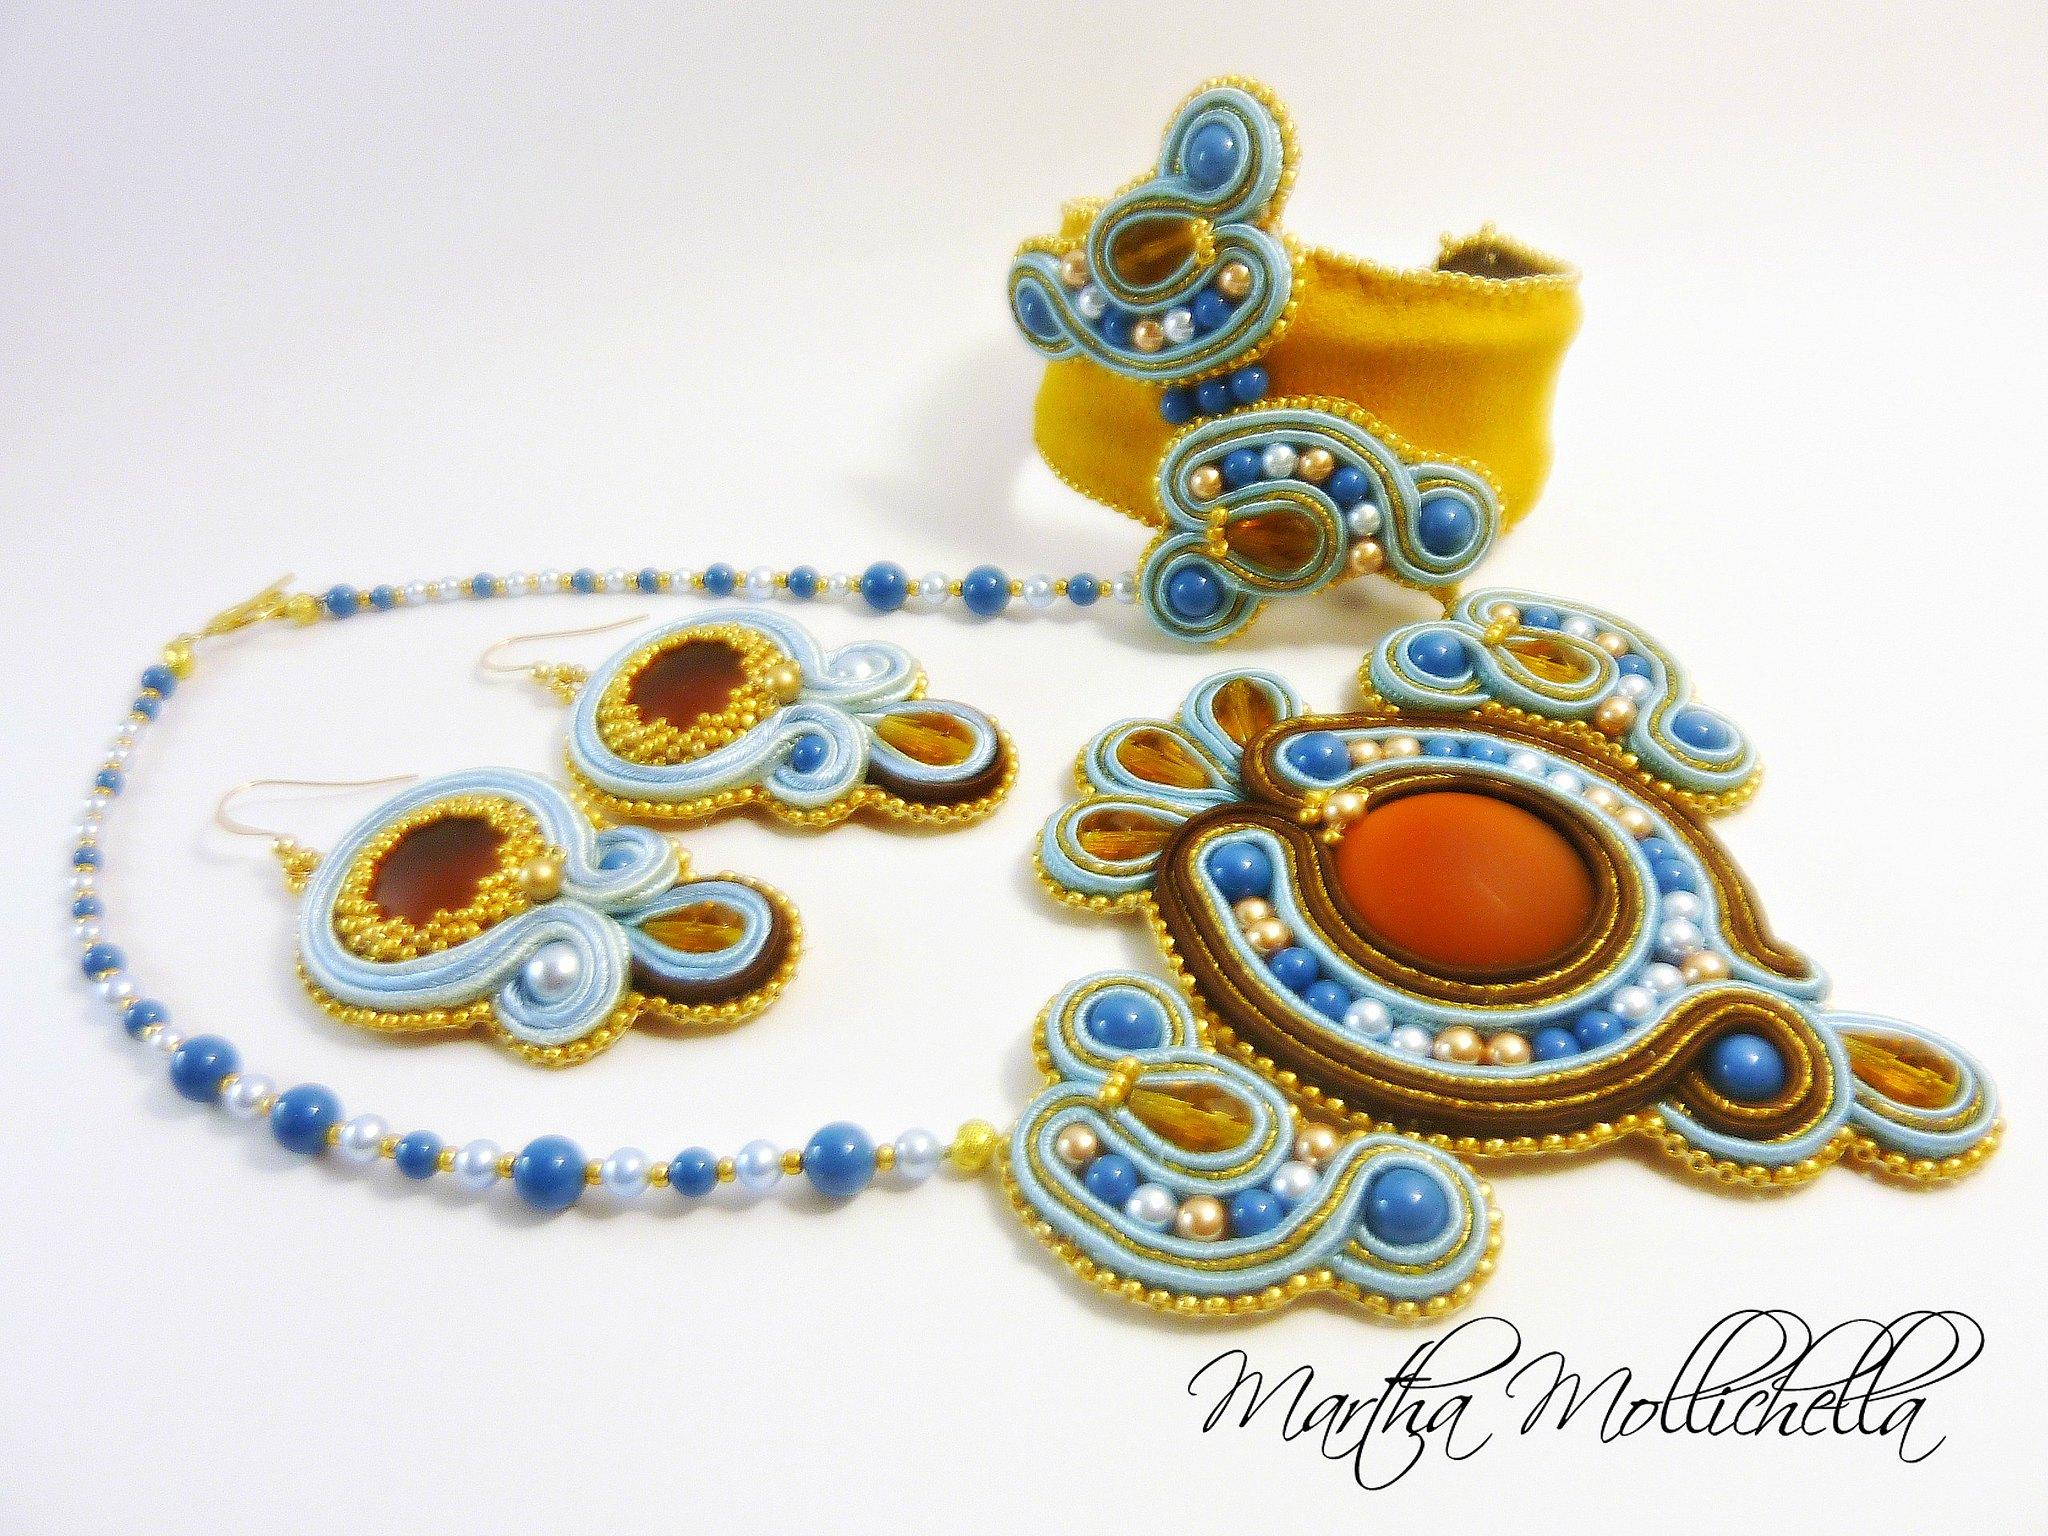 soutache jewels hand beaded jewellery hand made in Italy by Martha Mollichella Handmade jewelry